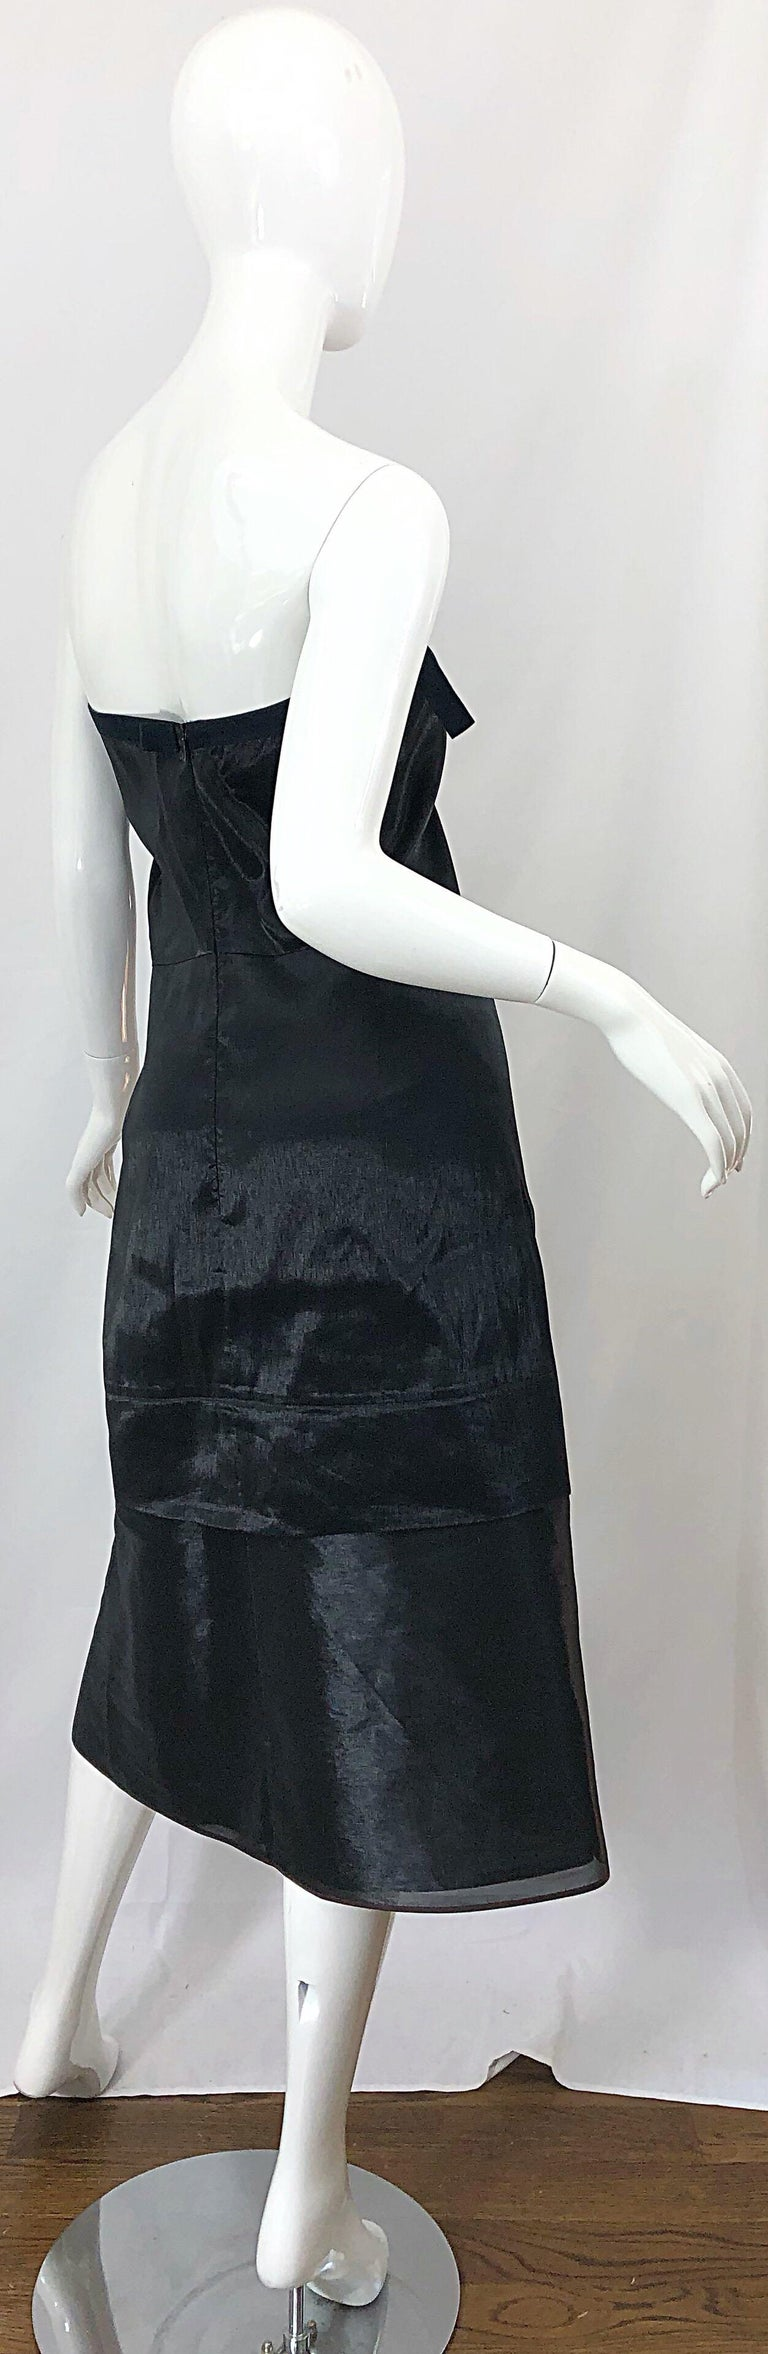 Jil Sander Size 8 Vintage Black Metallic Avant Garde Strapless 1990s Dress 90s For Sale 9